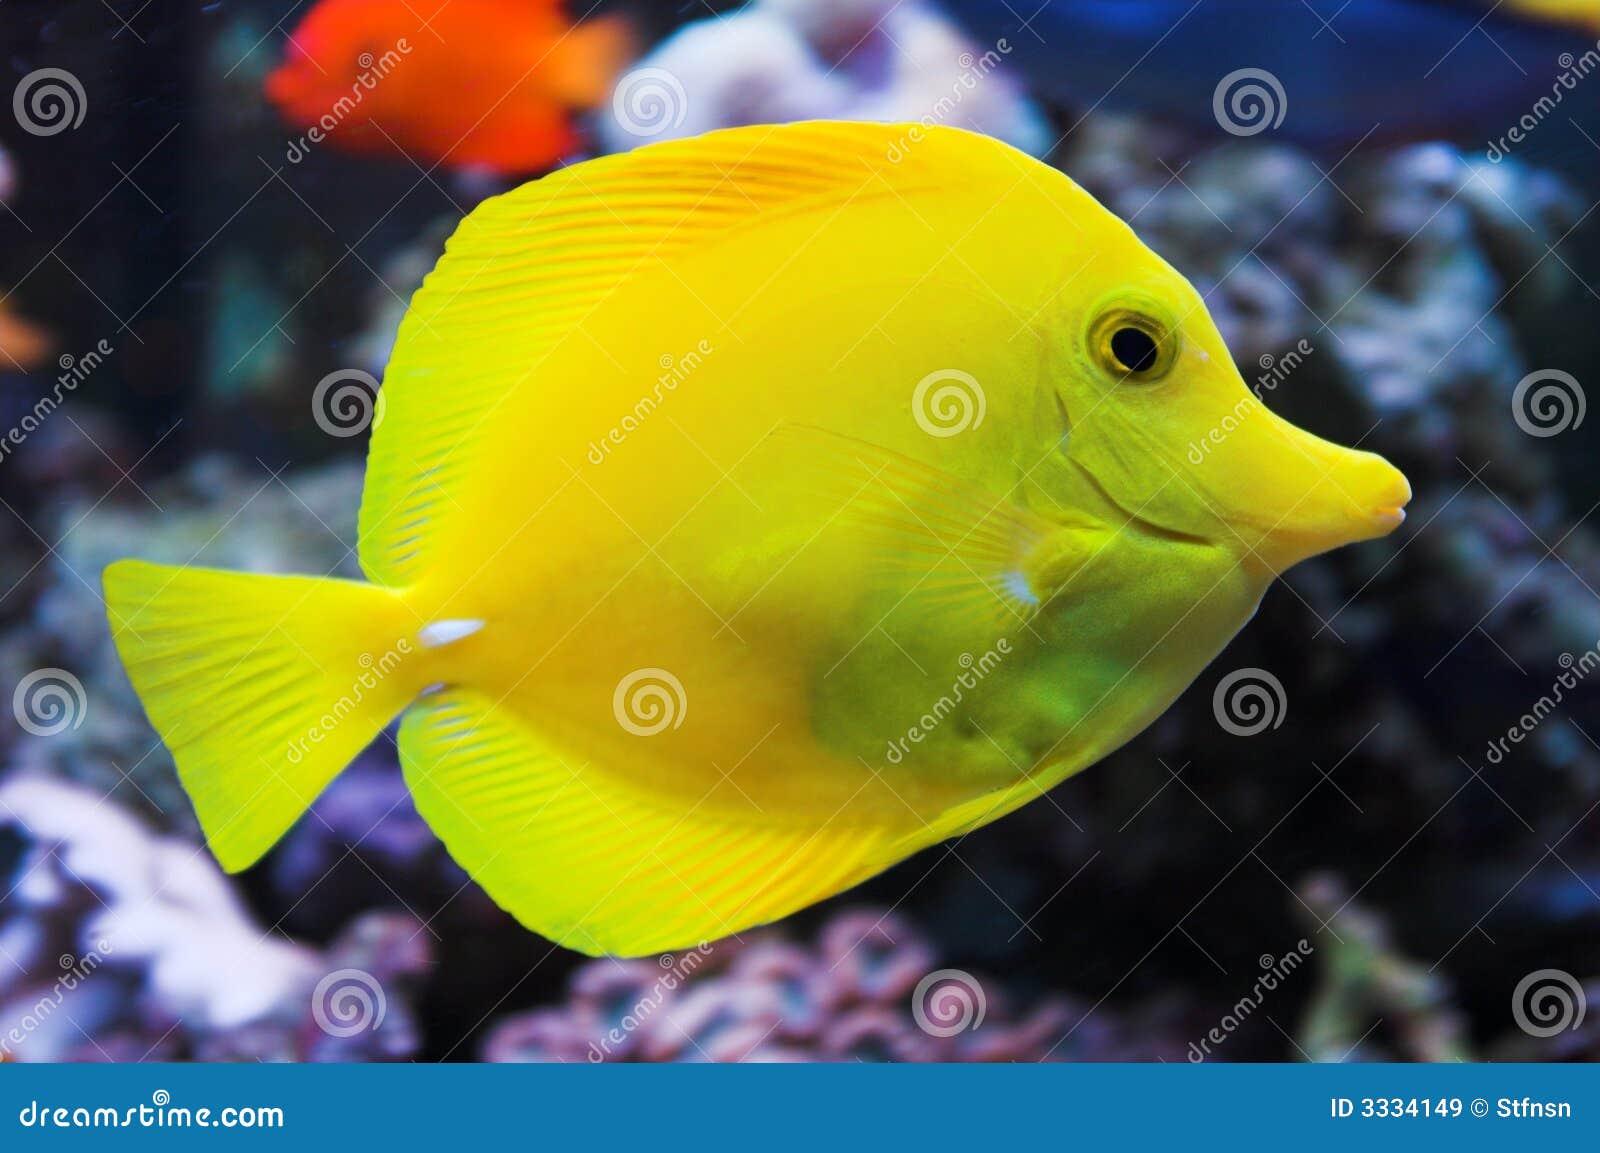 Yellow tang fish in aquarium stock image image 3334149 for Yellow tail fish